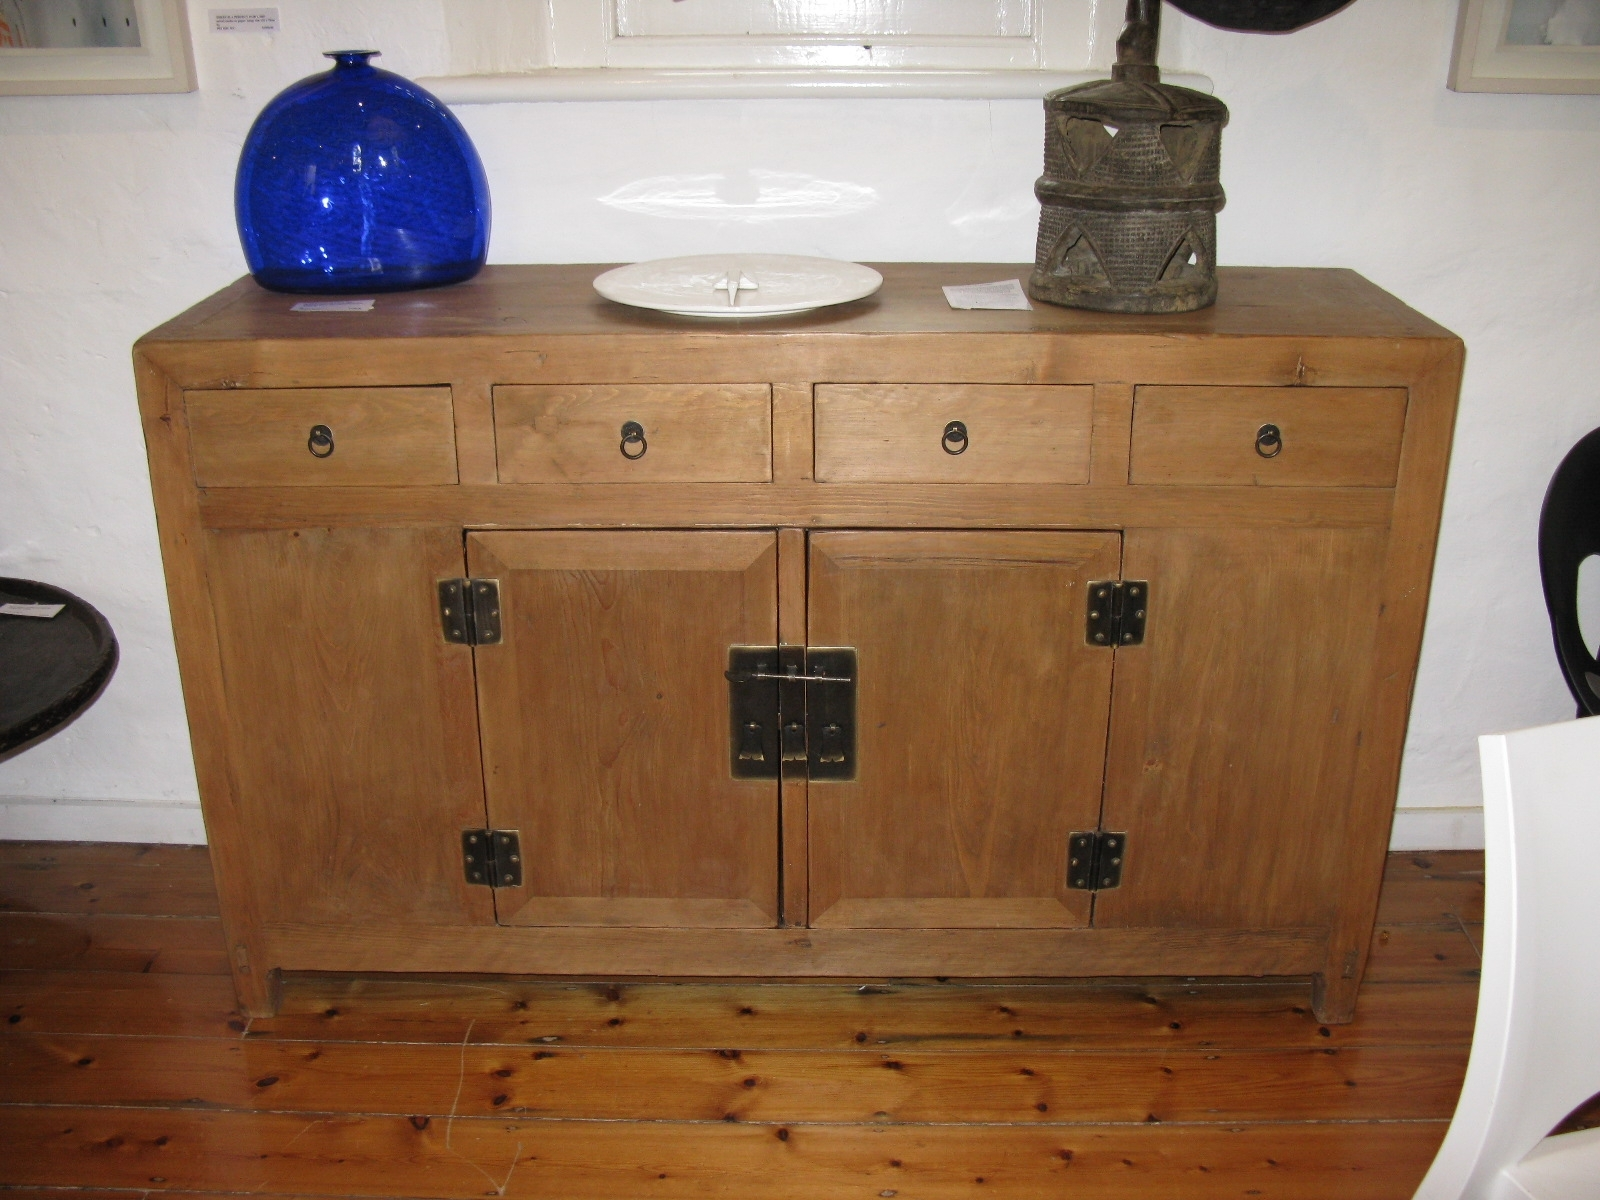 Antique Sideboards | Gallery Categories | Aptos Cruz Inside Most Current Antique Walnut Finish 2 Door/4 Drawer Sideboards (#2 of 20)